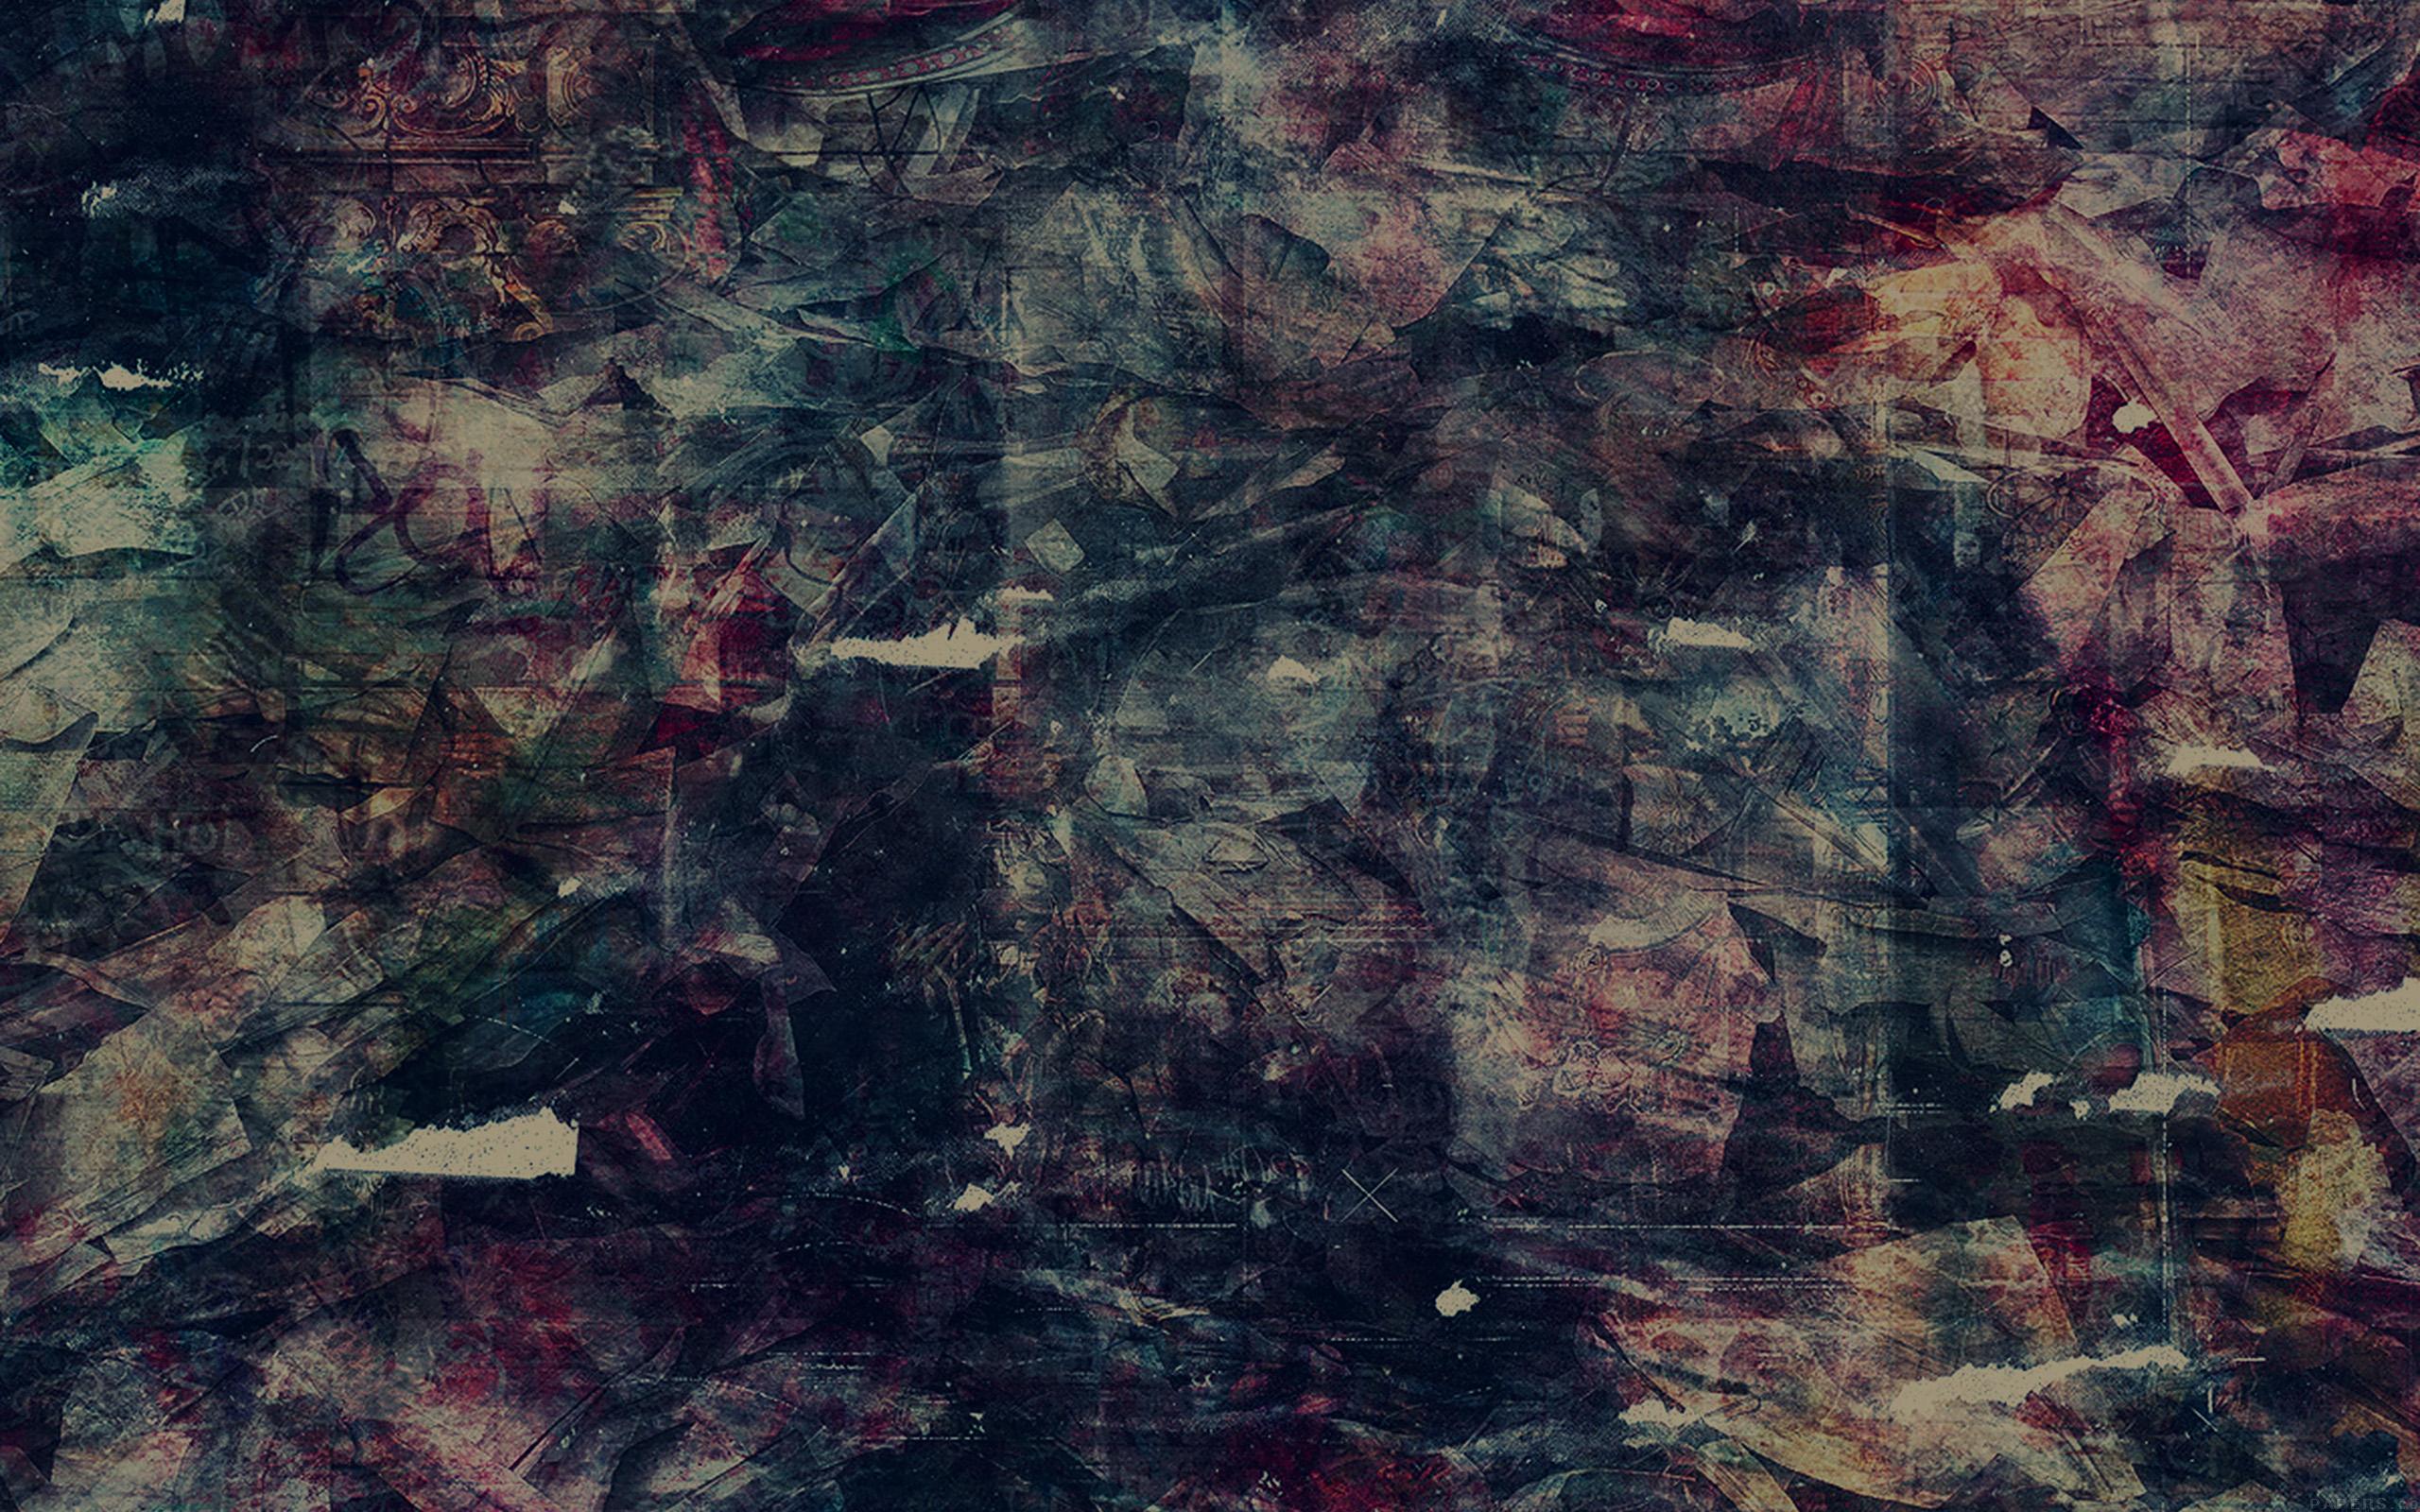 Cute Cloud Wallpaper Al31 Wonder Lust Art Illust Grunge Abstract Dark Papers Co